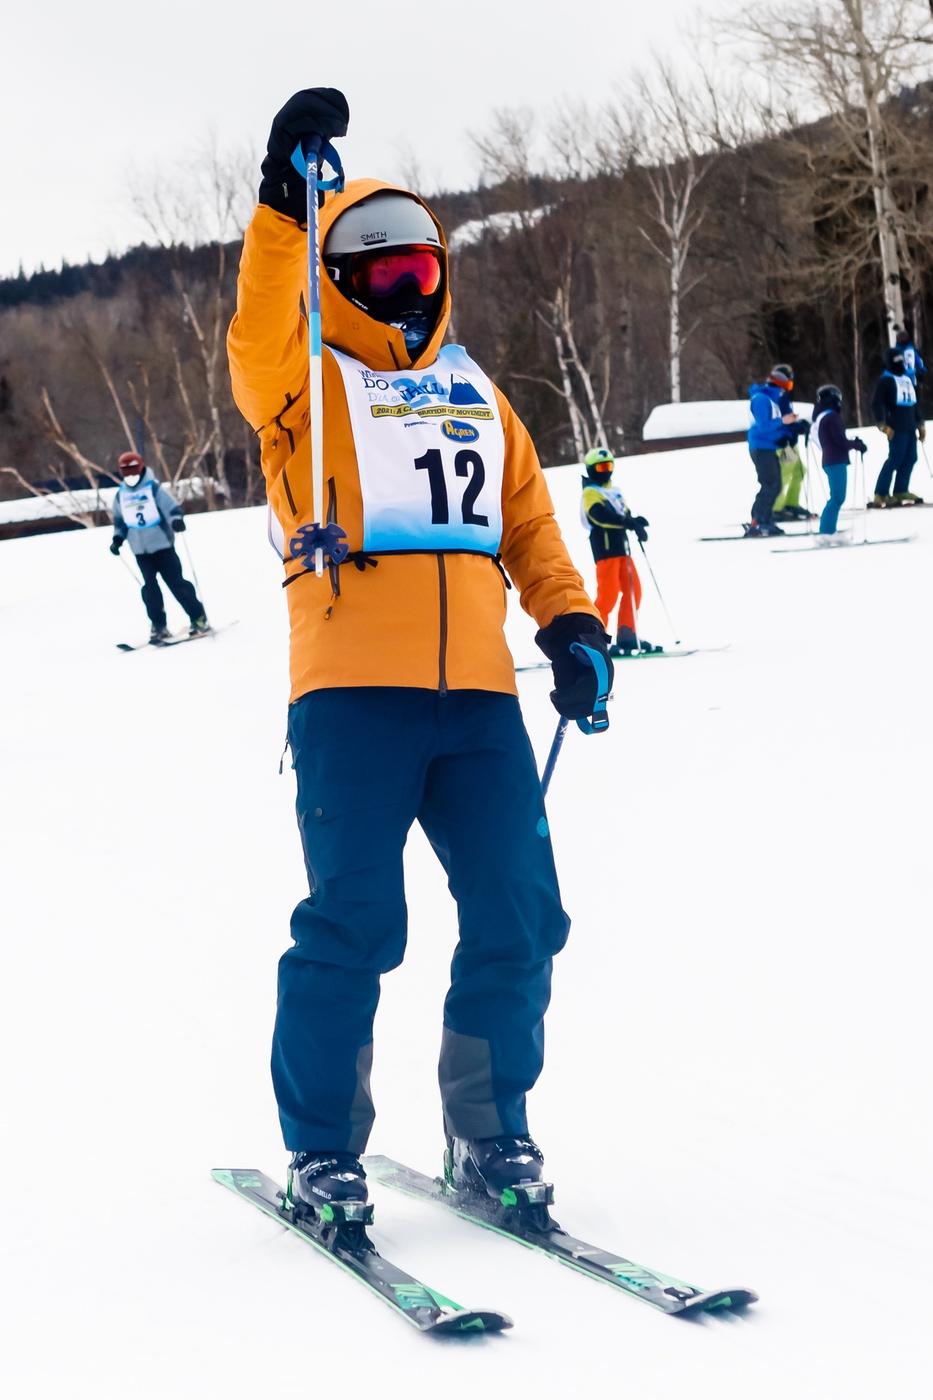 WinterKids Downhill 24 2021 SDP 2919